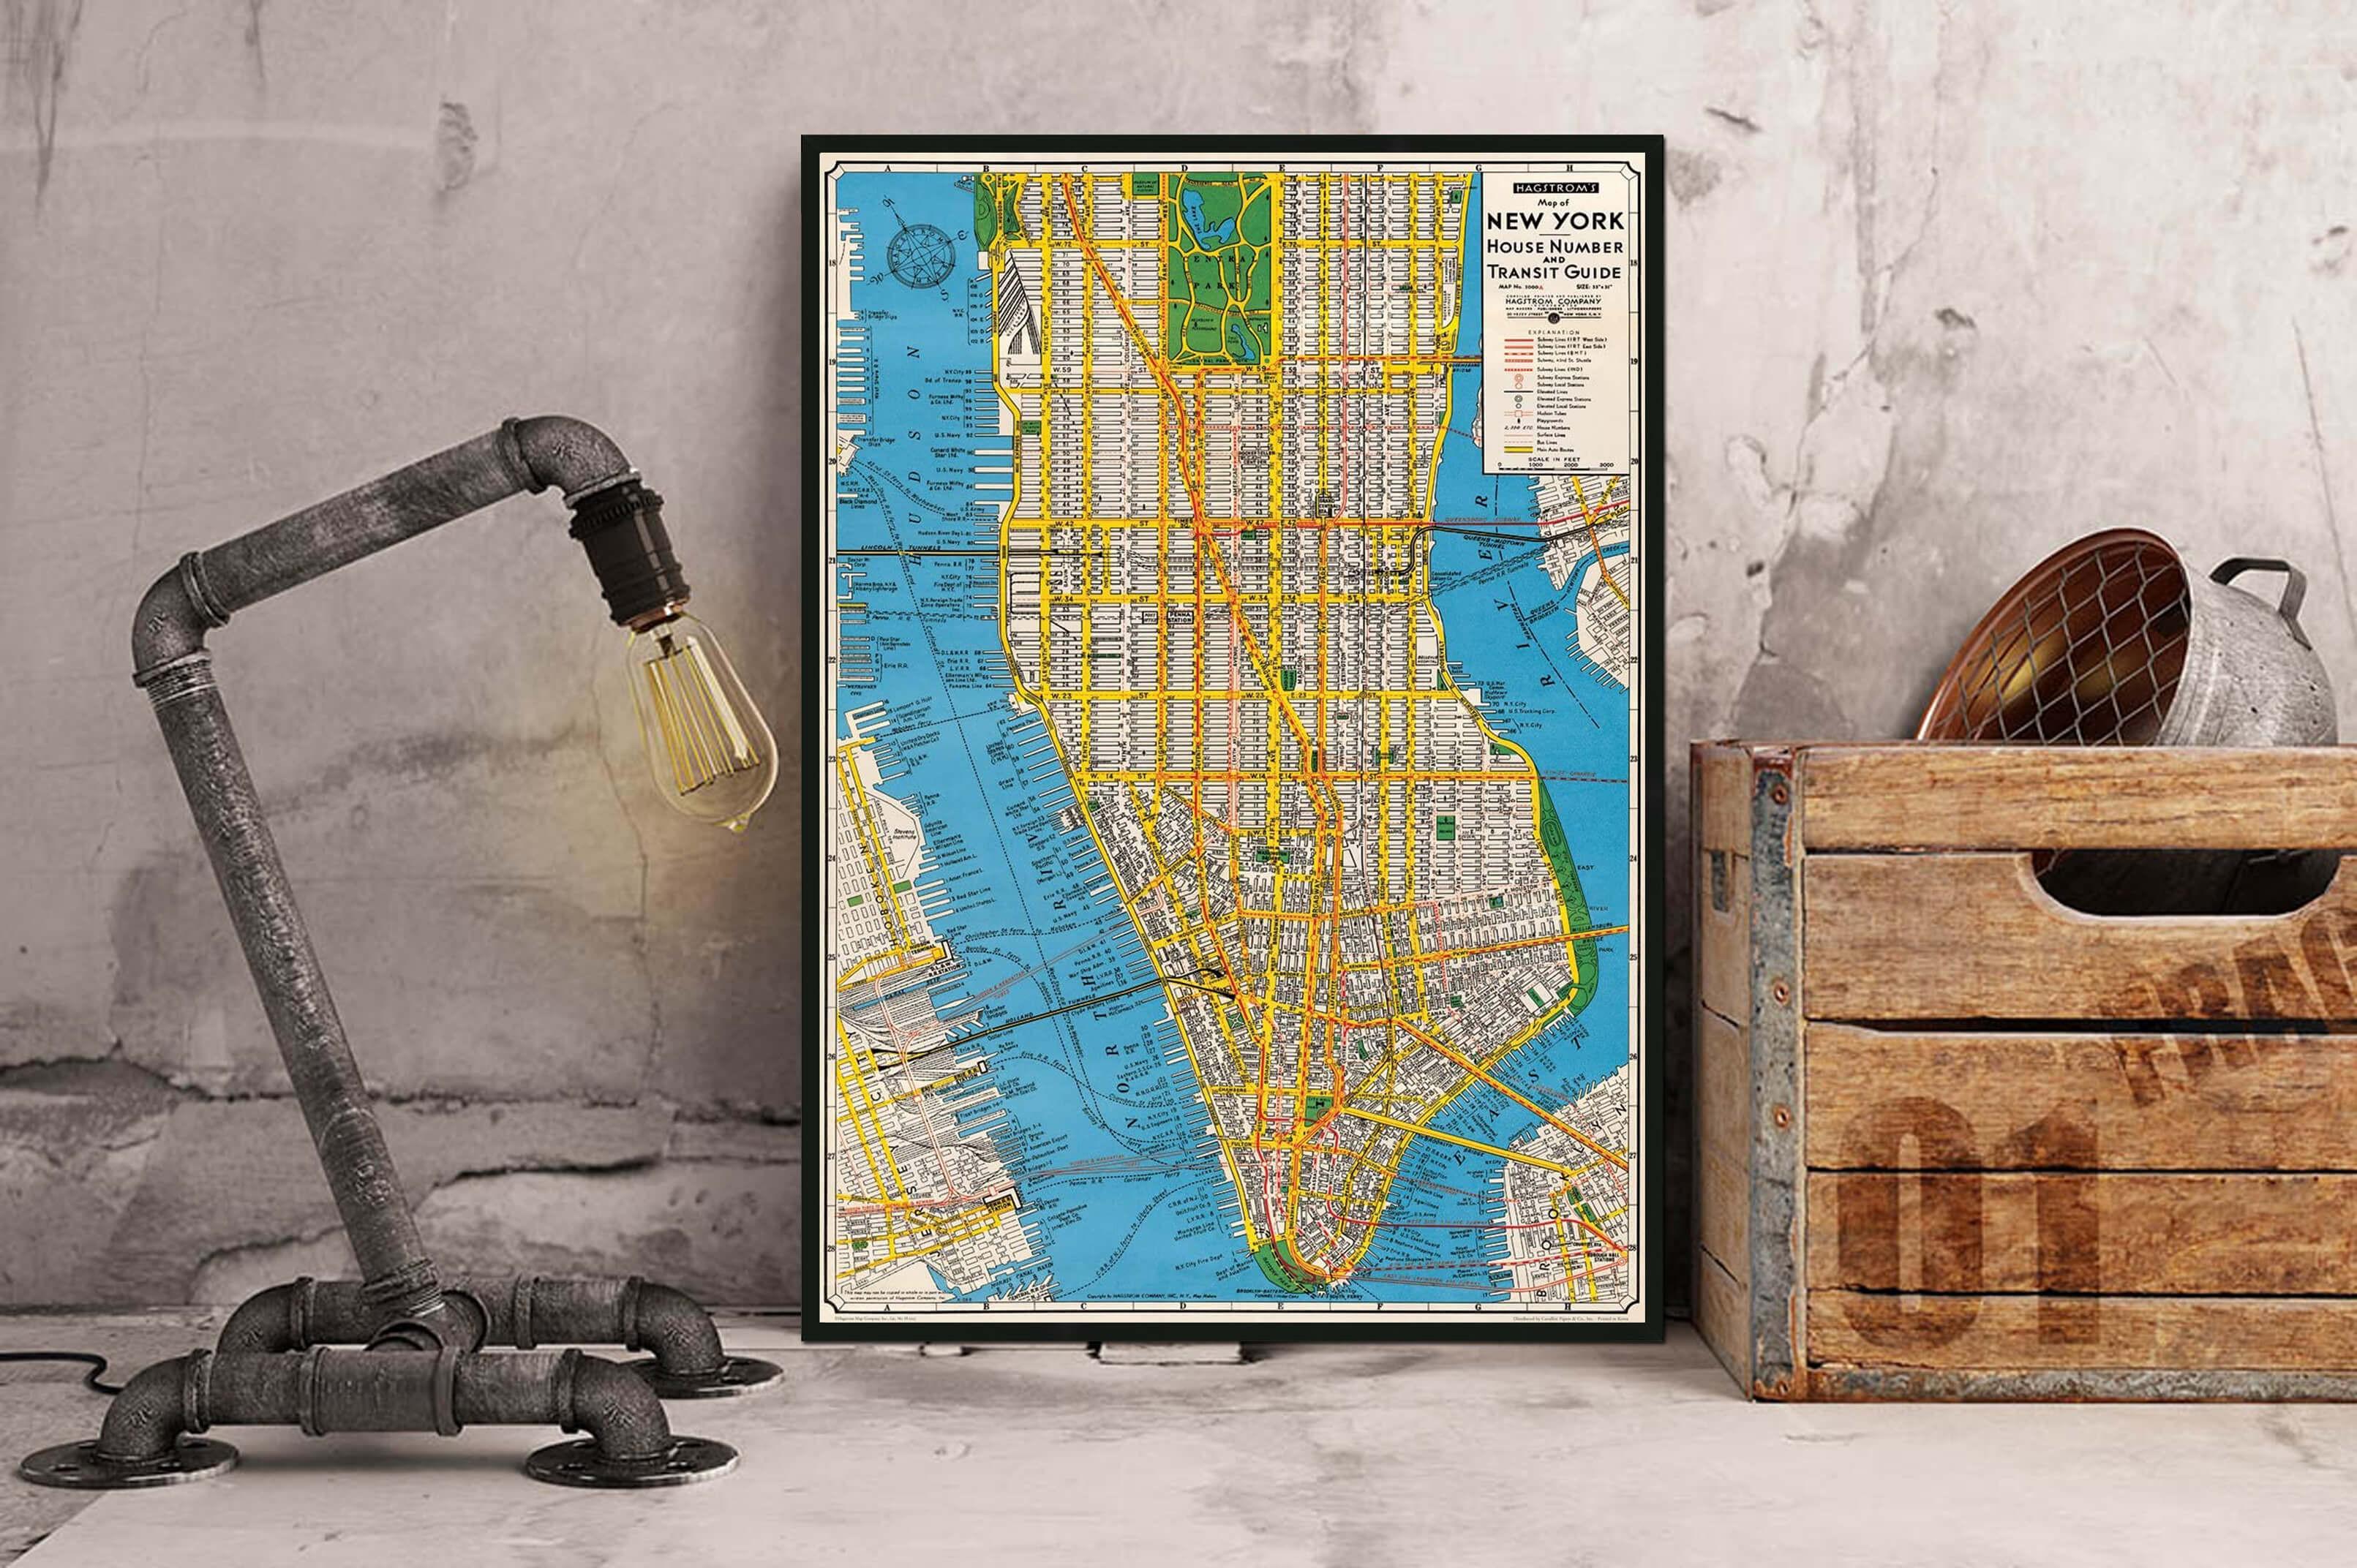 6 - Plan de New York